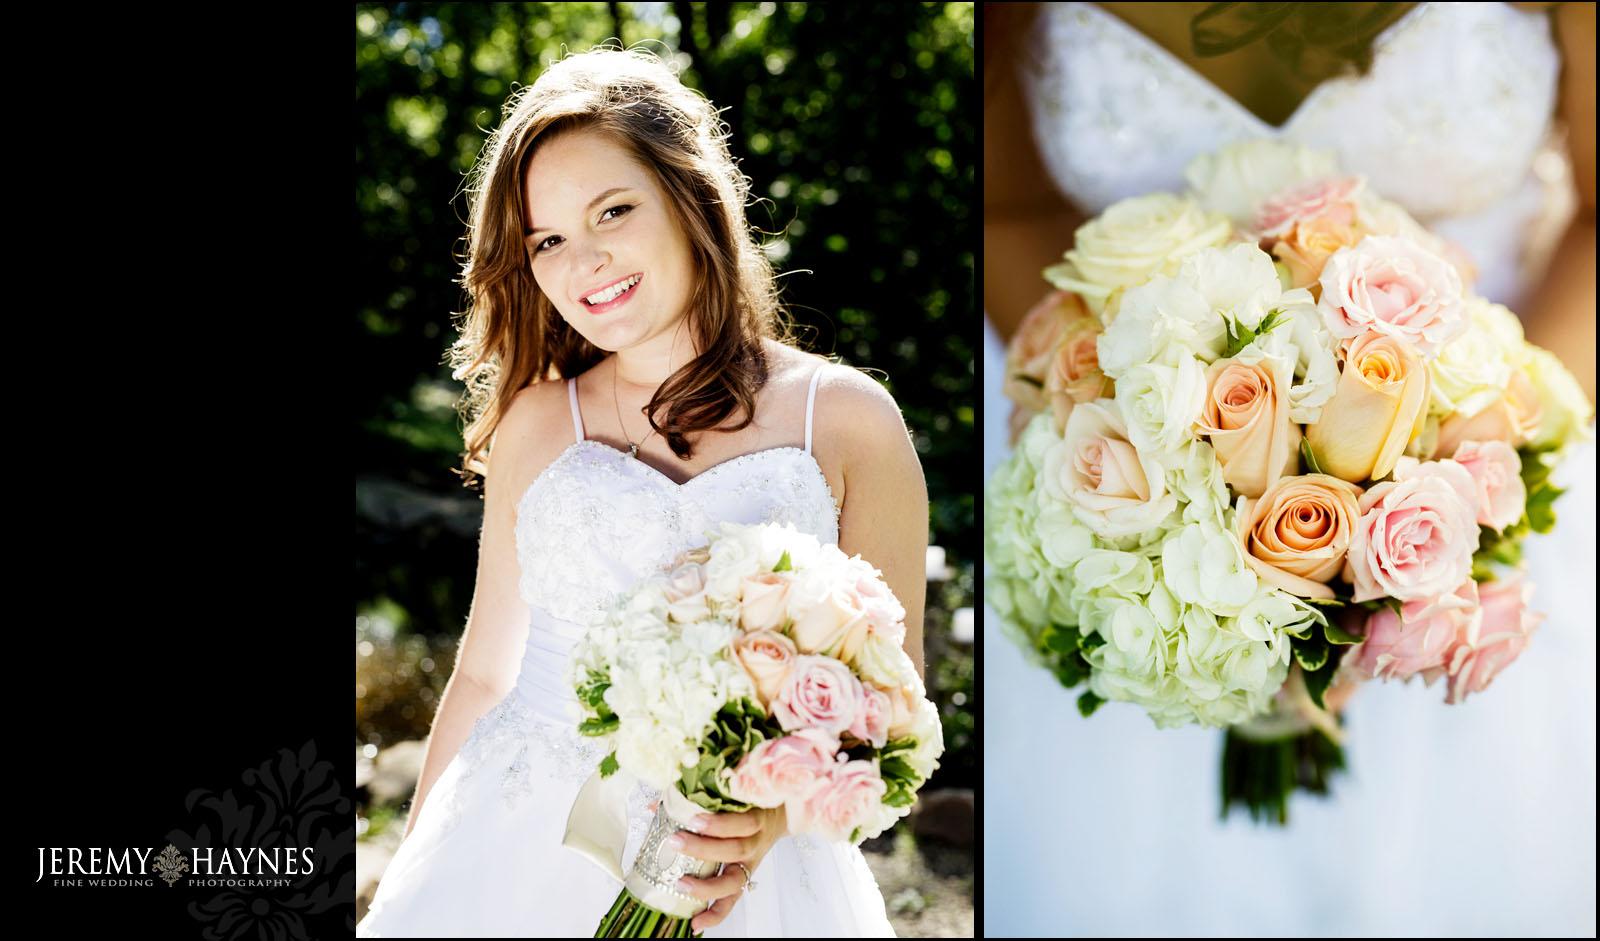 beautiful-avon-gardens-bridal-photos-jeremy-haynes-photography-wedding.jpg